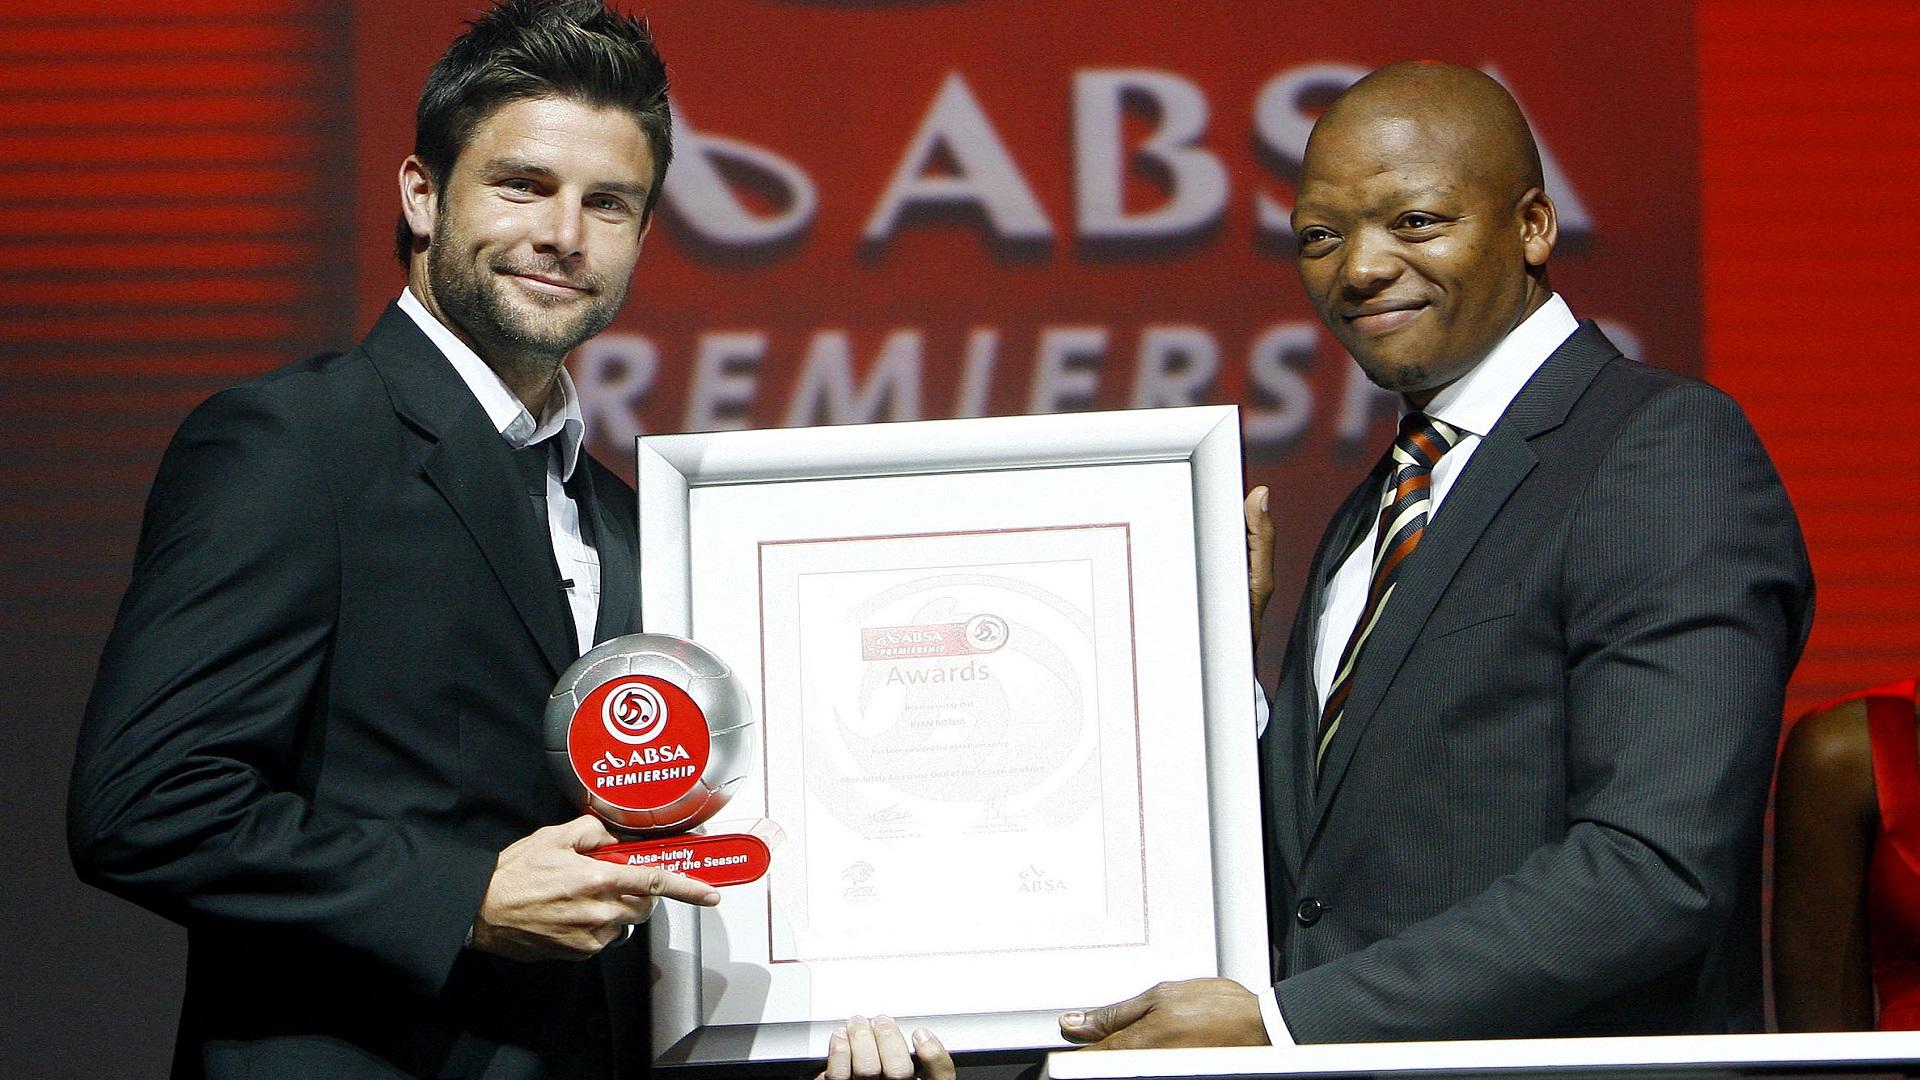 Ryan Botha Moroka Swallows winning winning absa-lutley awesome goal PSL 2008/2009